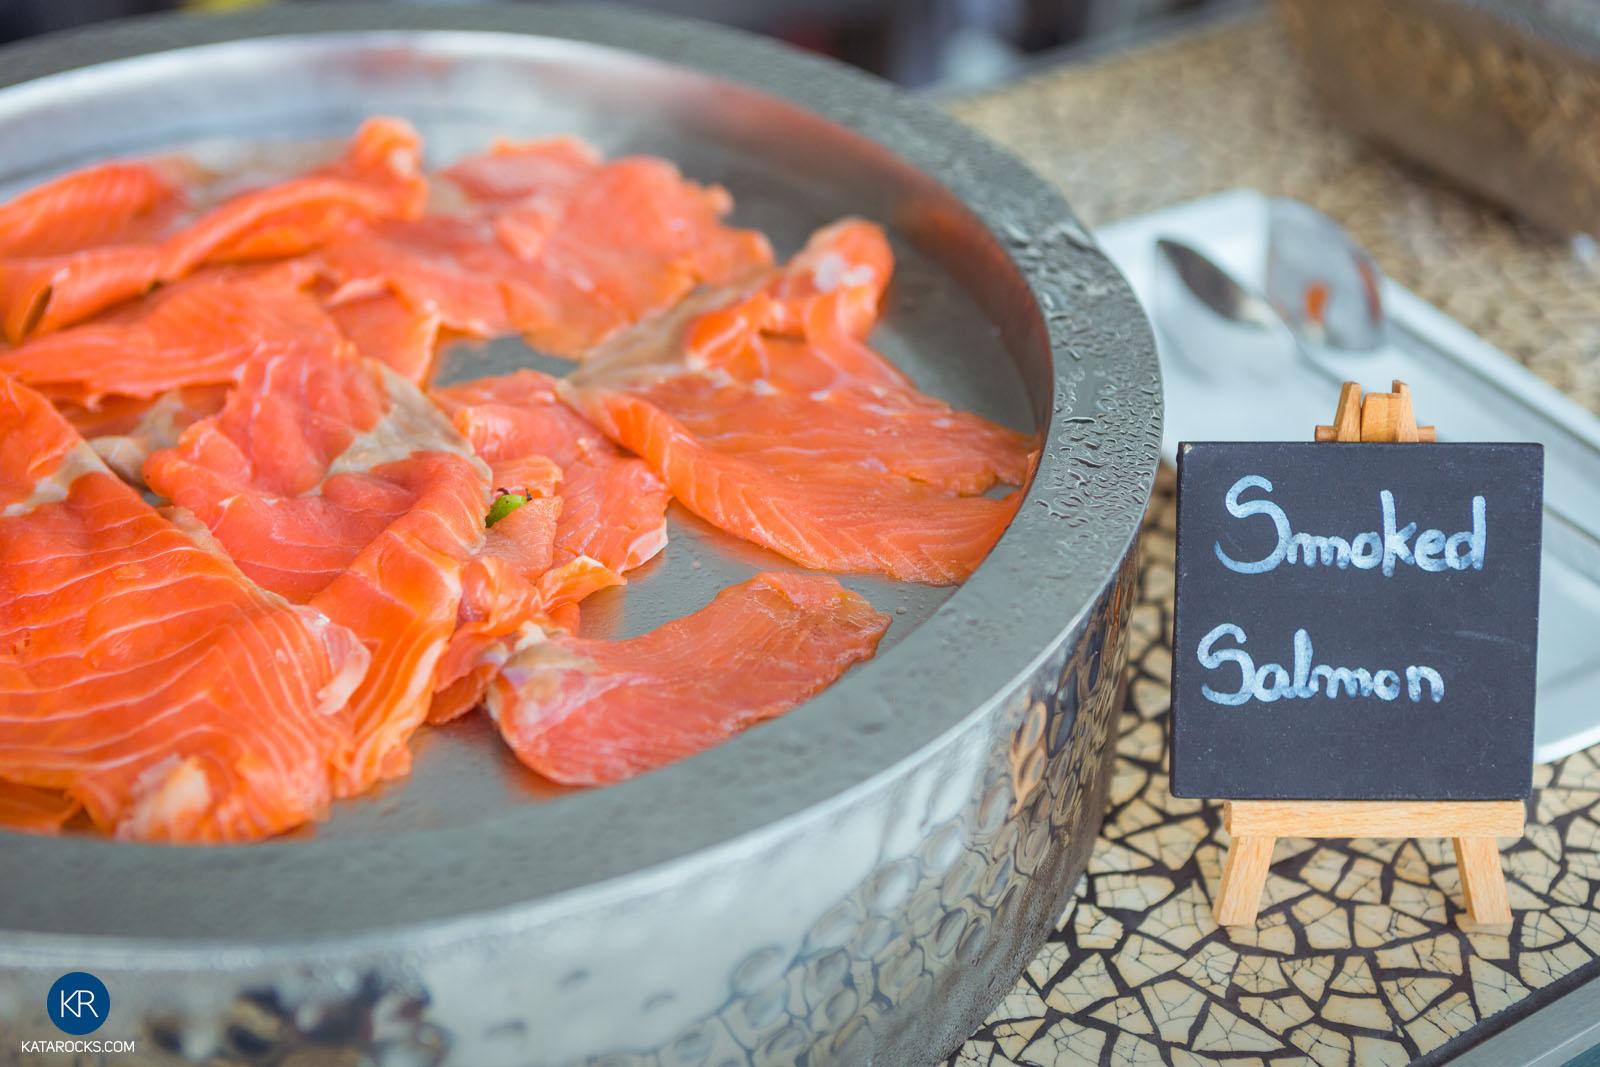 Smoked salmon - Best Breakfast in Phuket